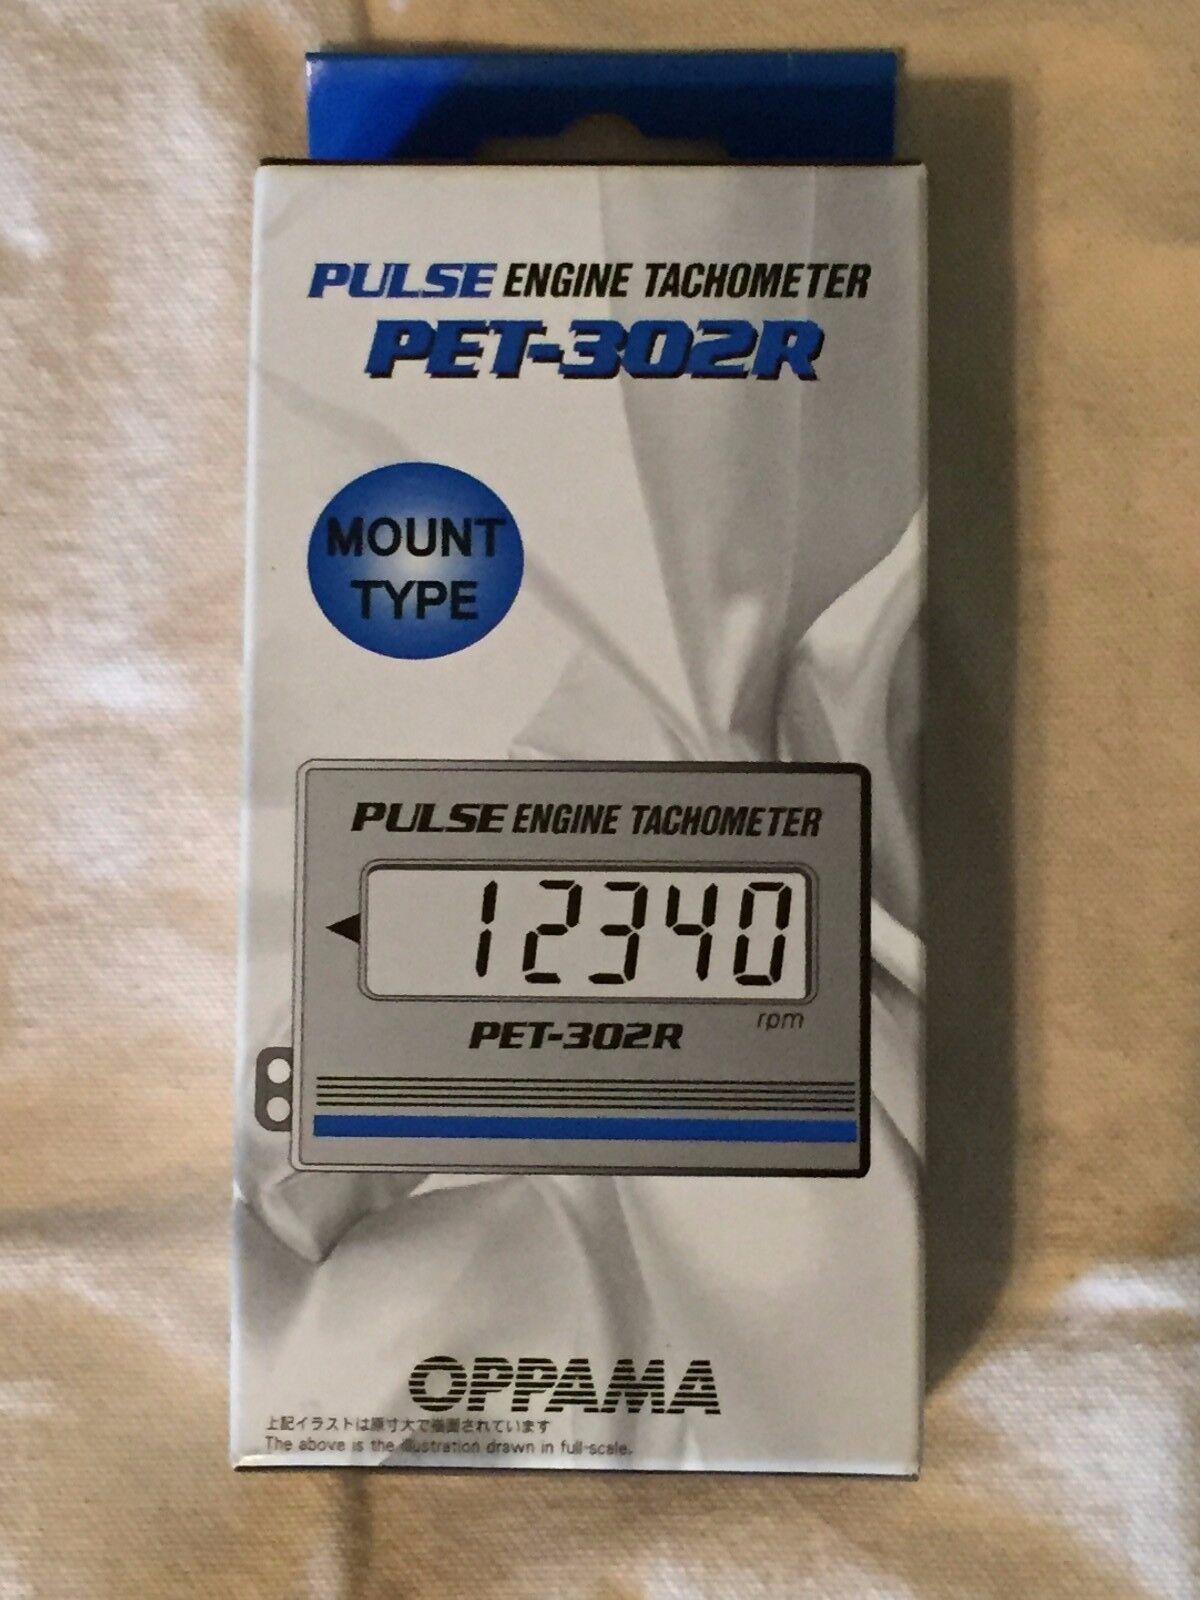 Perfect Oppama Tachometer Small Oppama Tachometer Small Small Engine Tachometer Amazon Small Engine Tachometer Napa houzz-03 Small Engine Tachometer